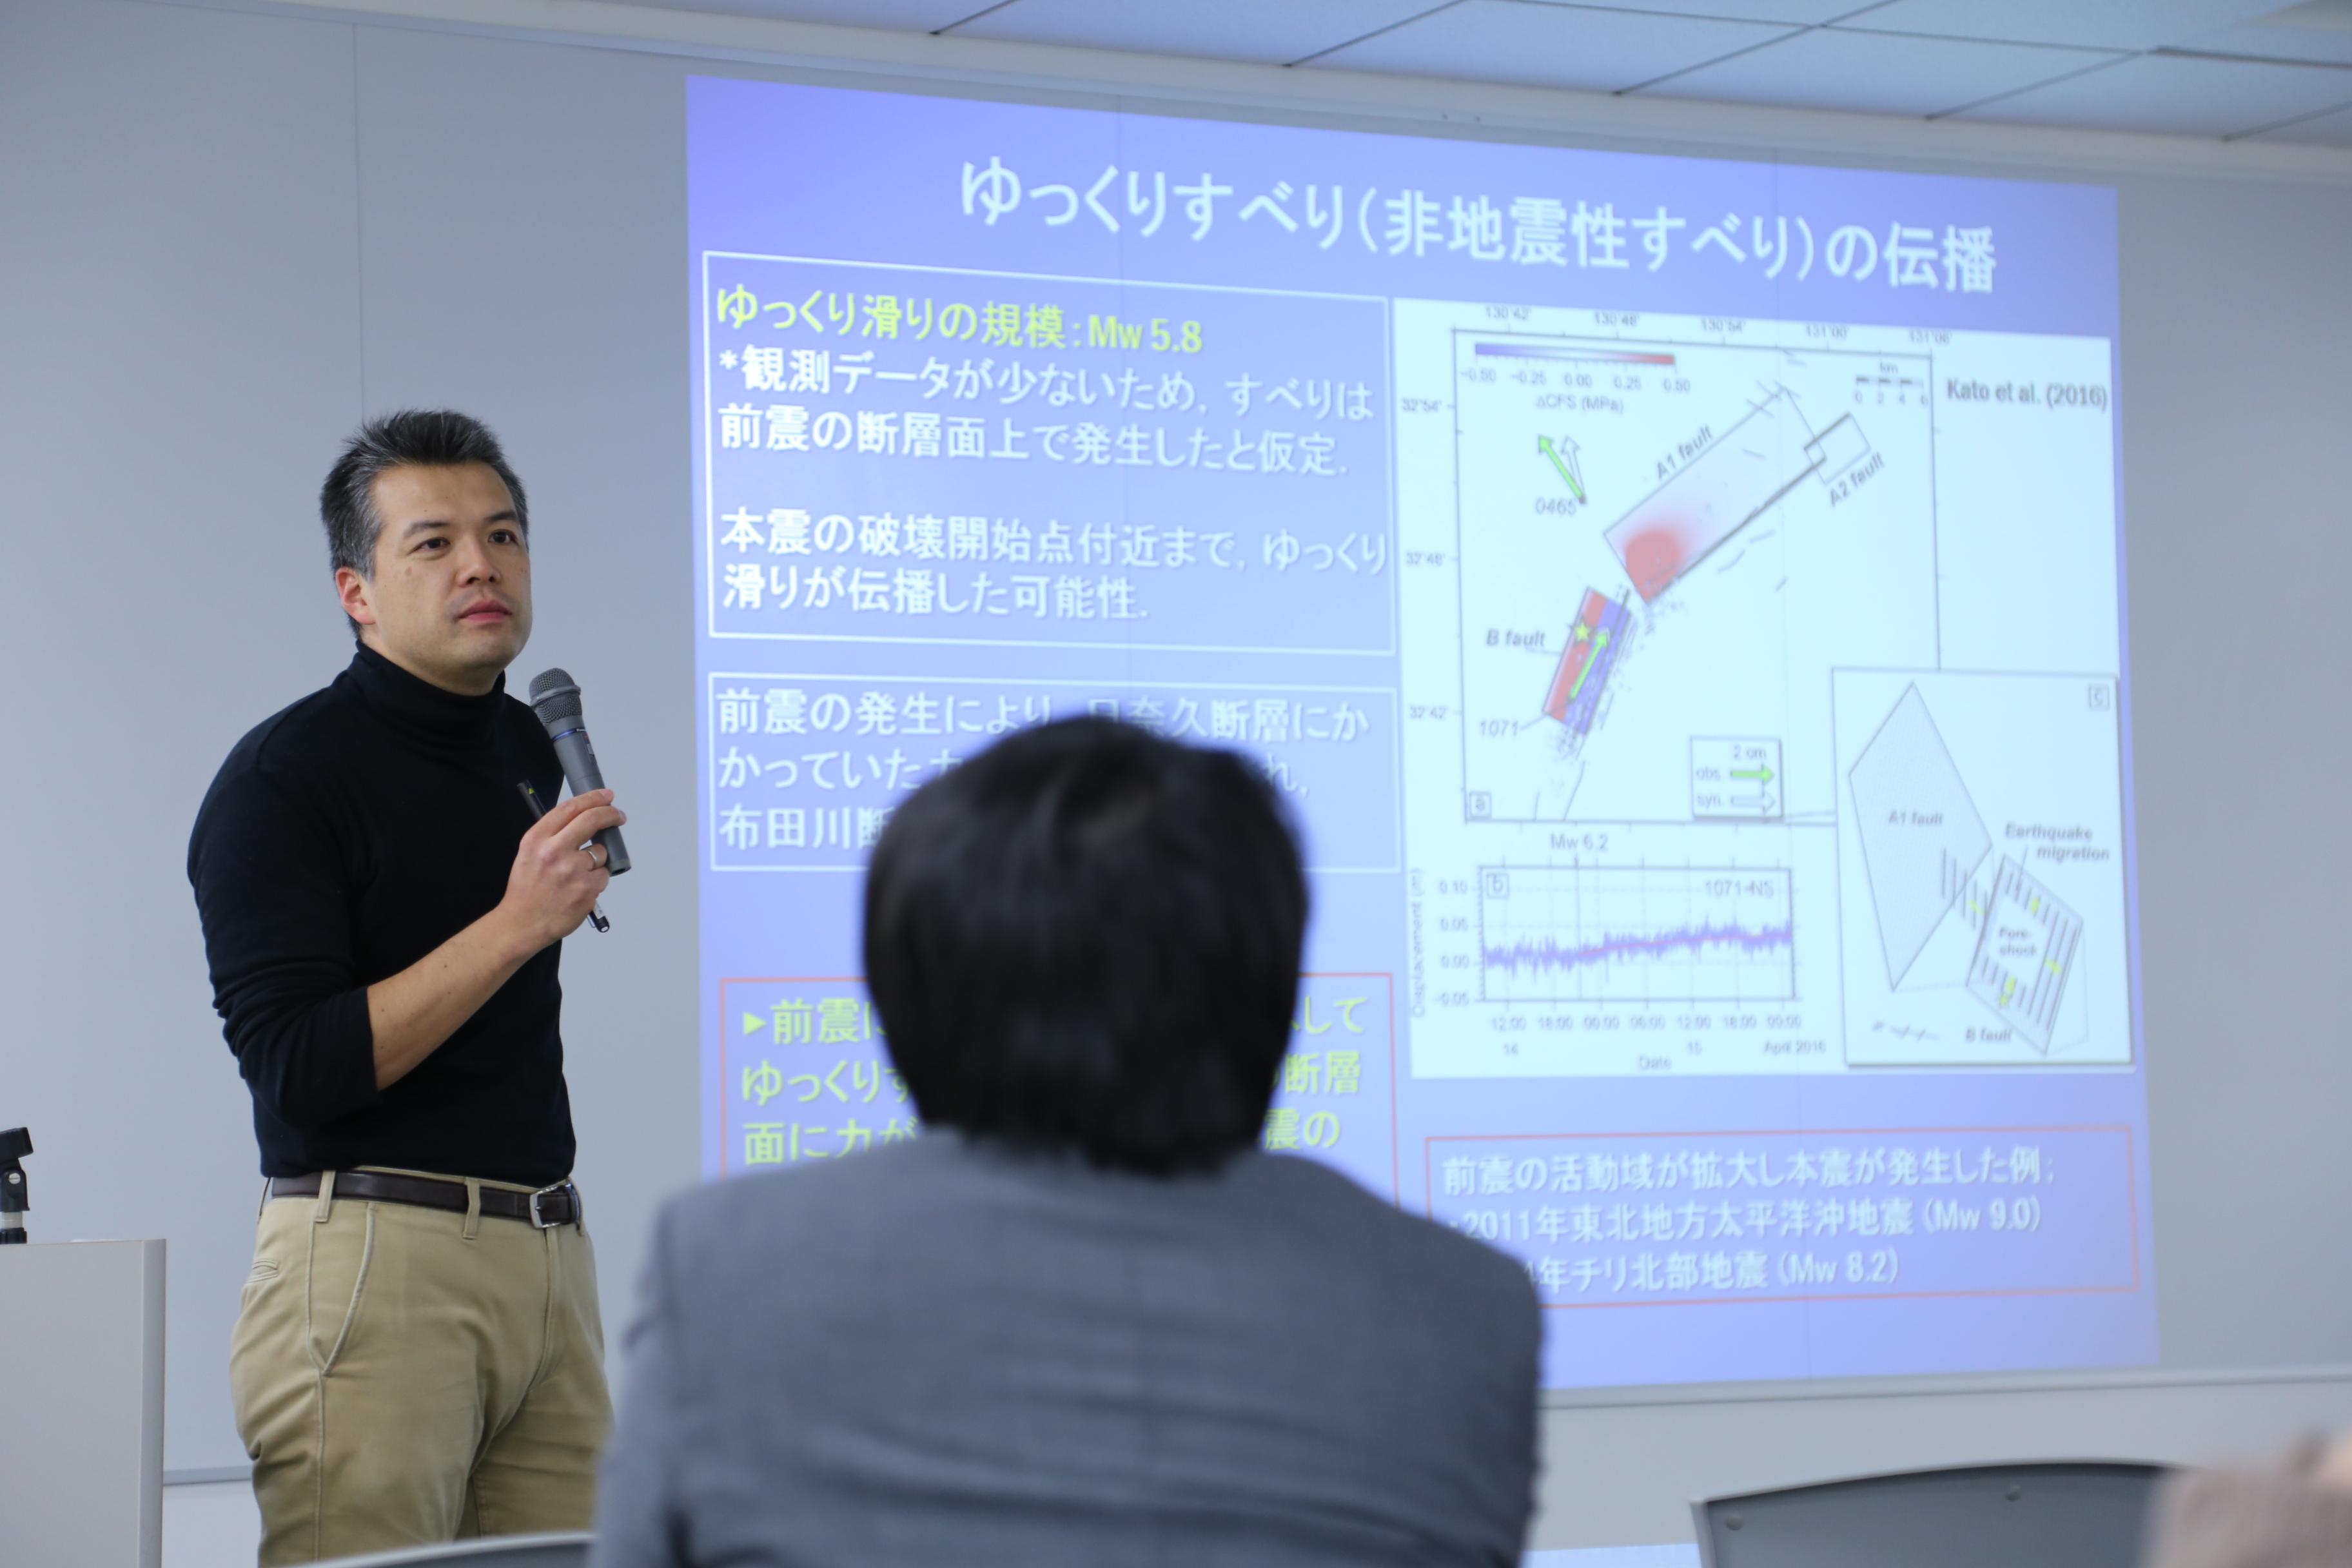 開催報告:懇談の場「2016年熊本地震の本震前に前震域が拡大」